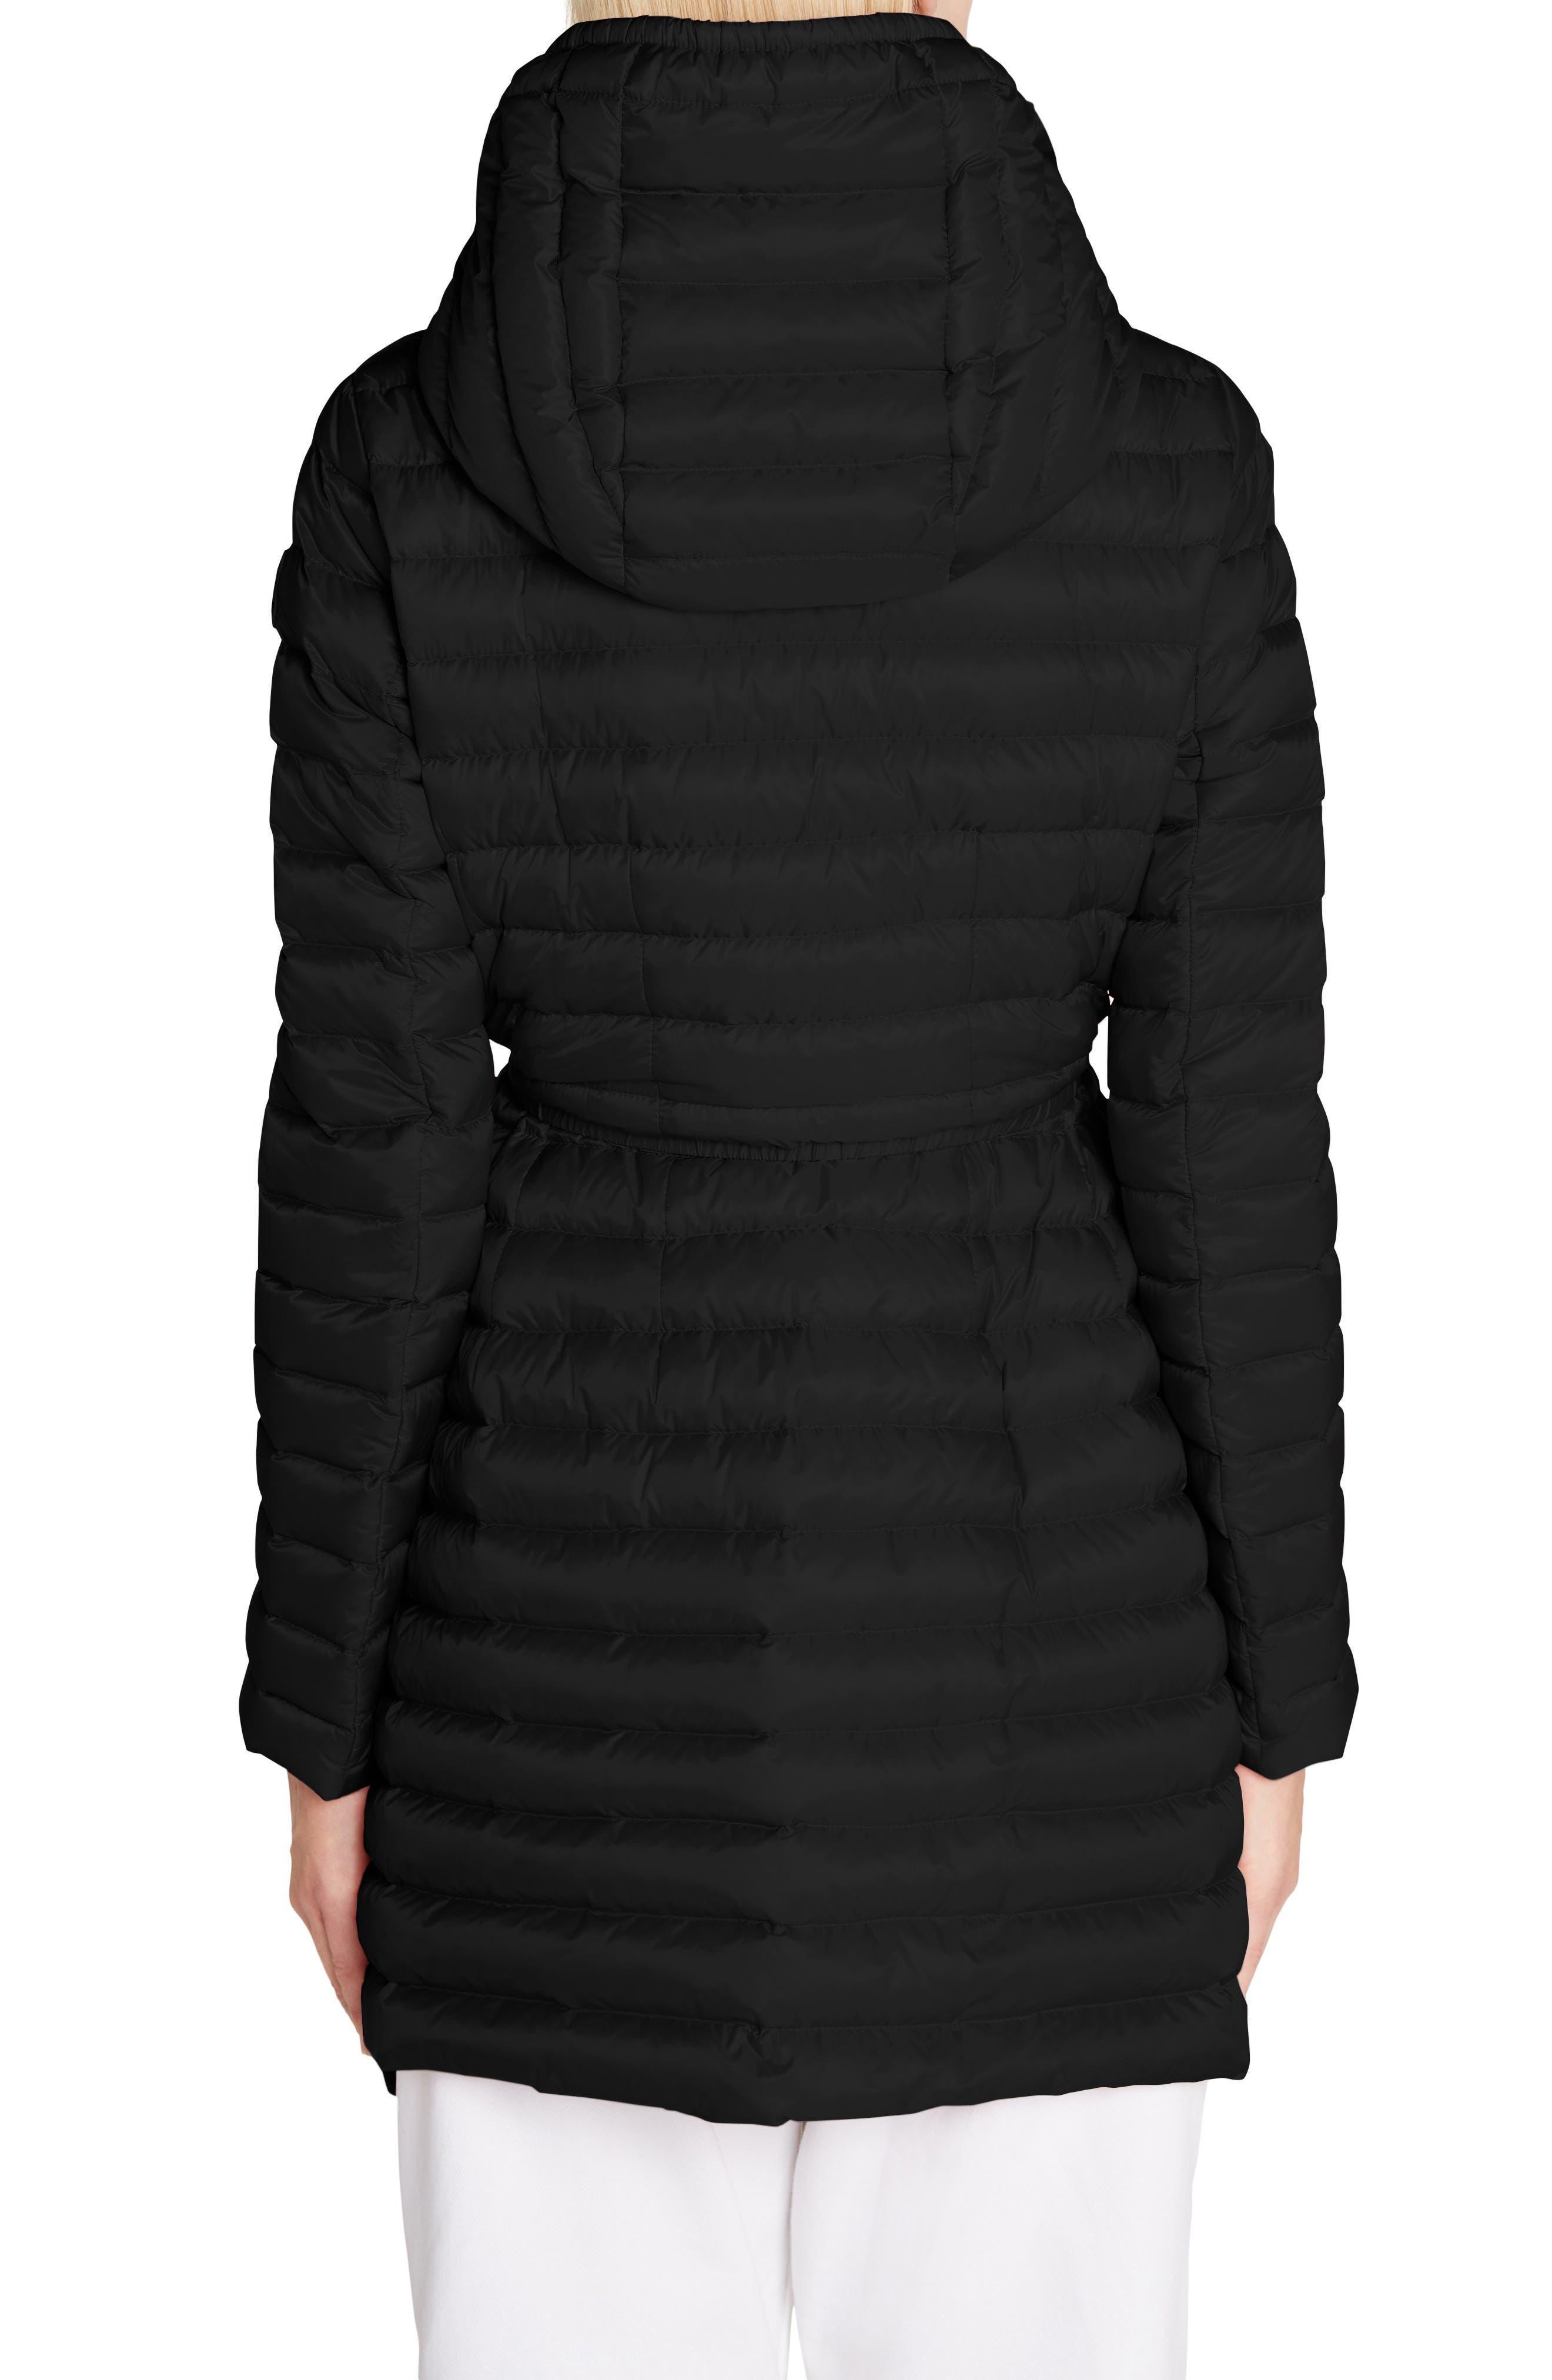 MONCLER,                             Barbel Water Resistant Long Hooded Down Jacket,                             Alternate thumbnail 2, color,                             001